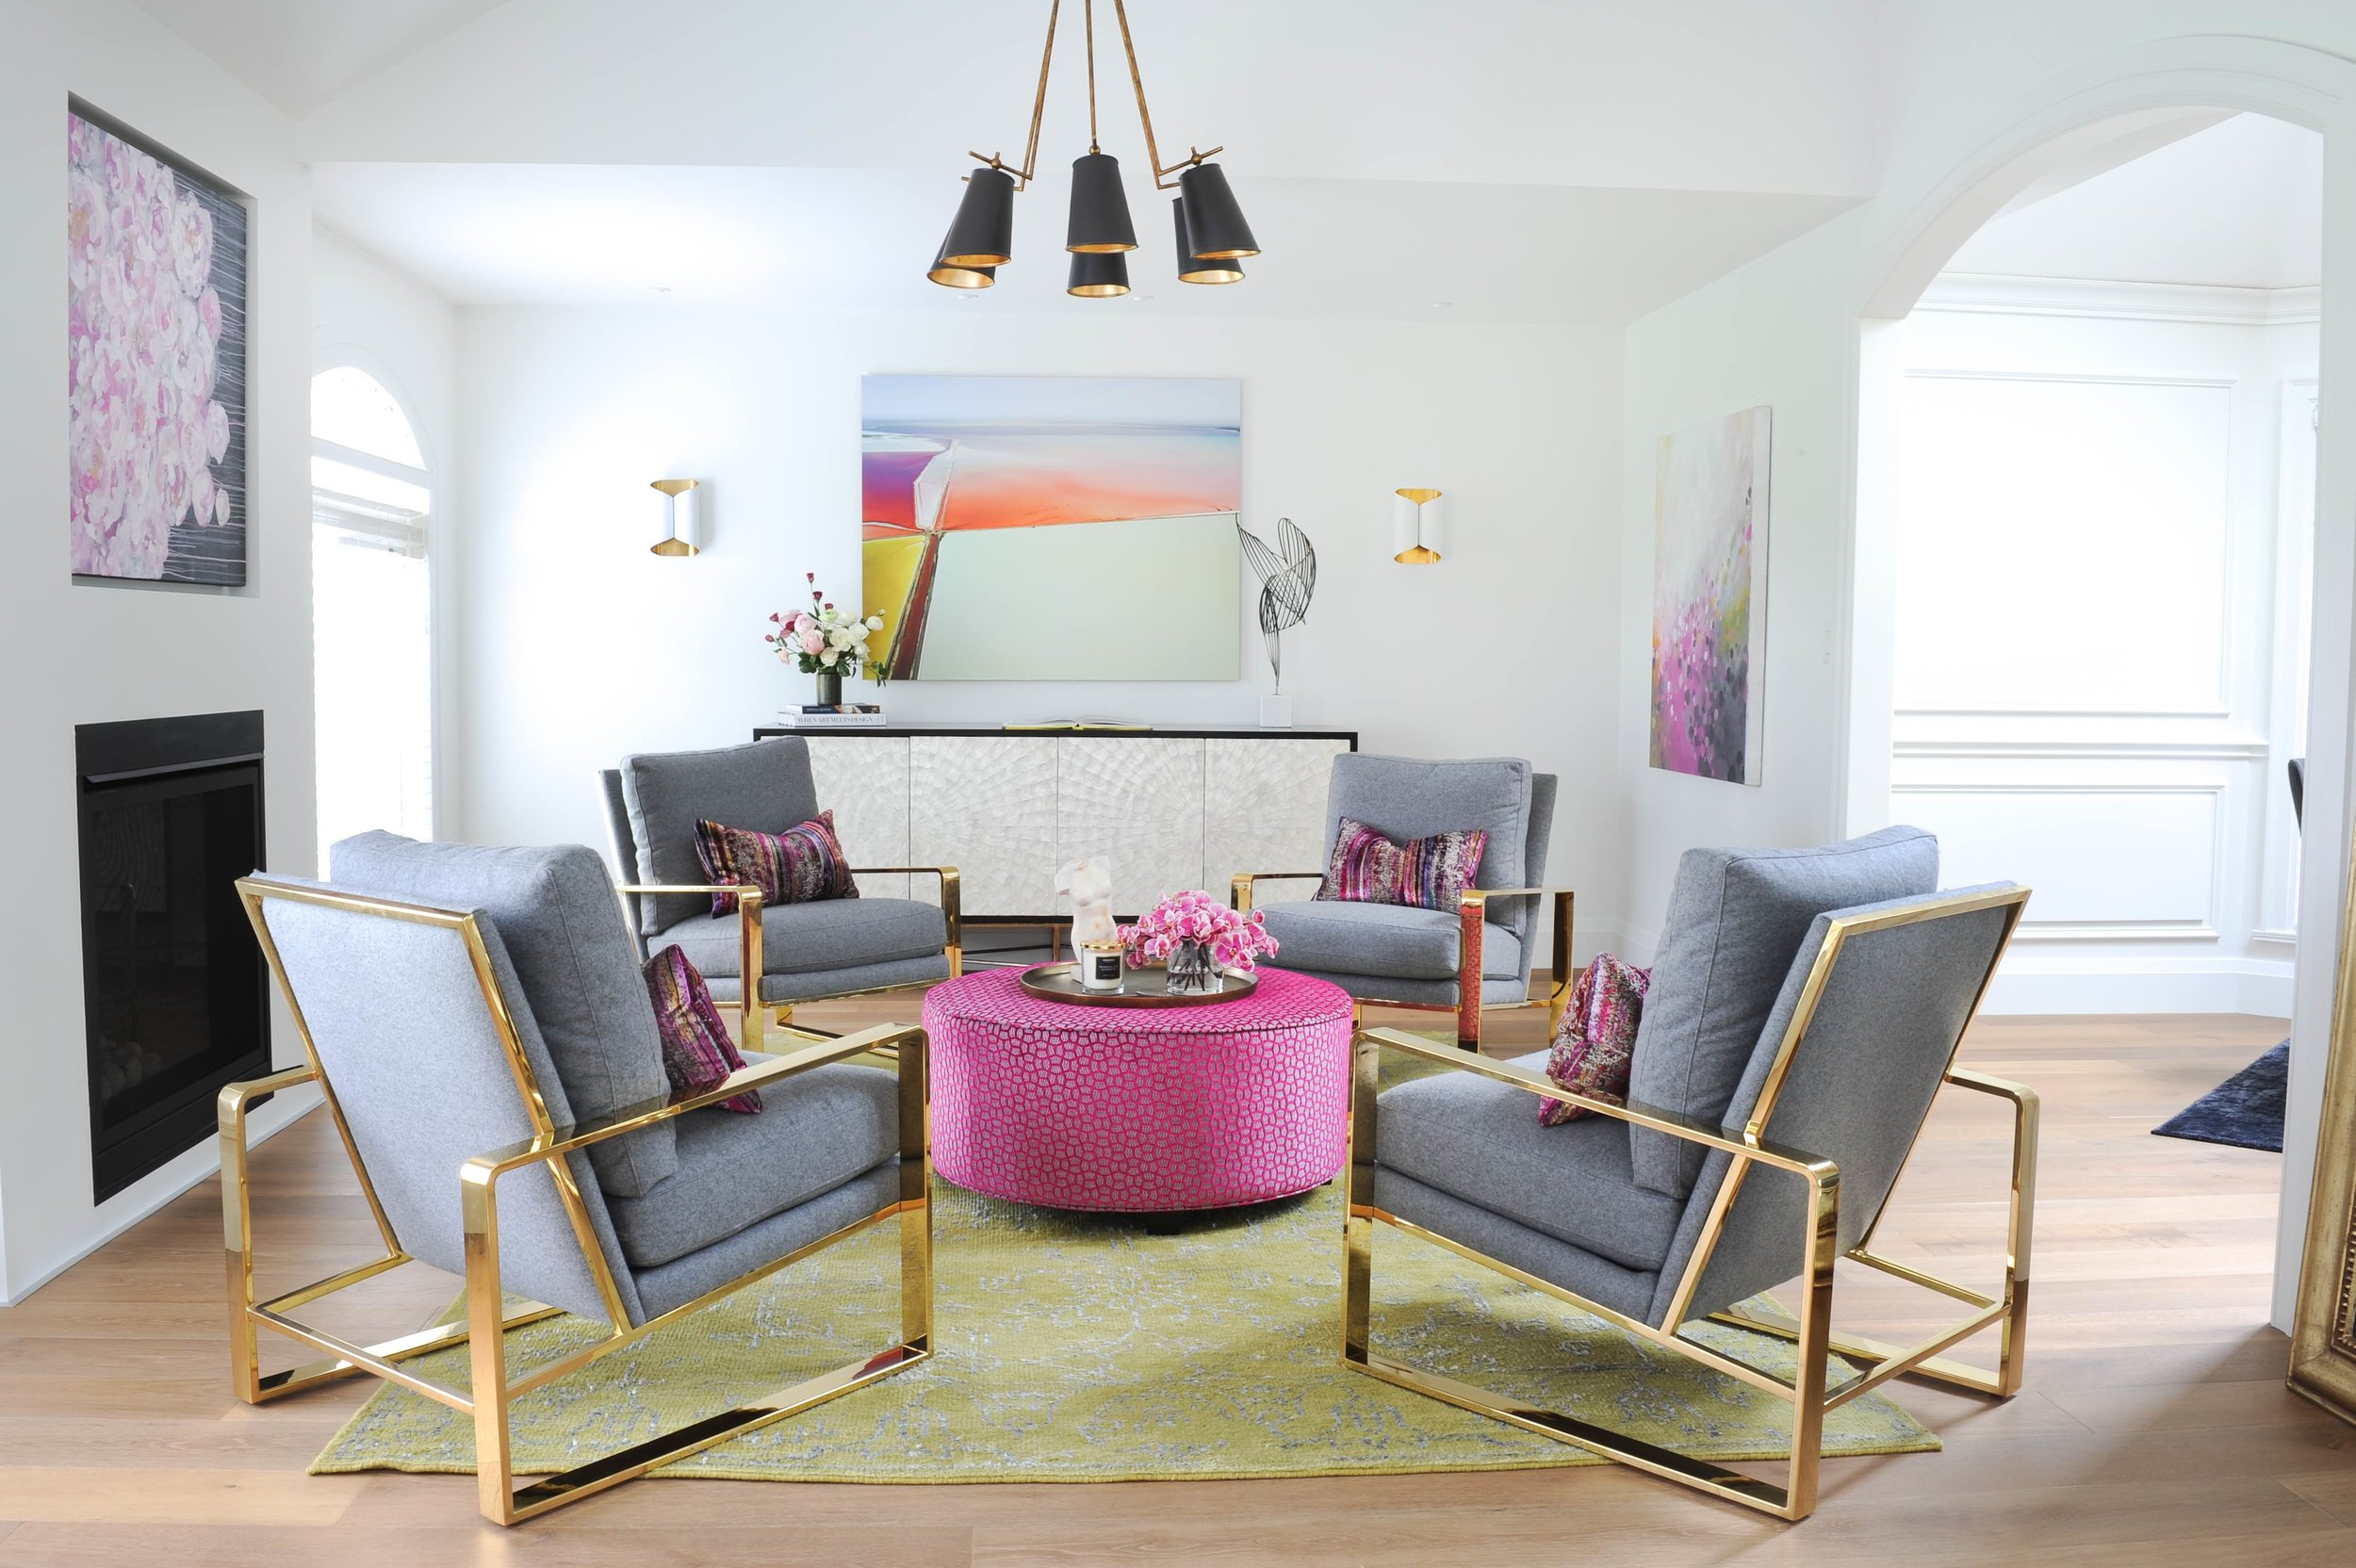 Approchable Luxury & Colourful interior design